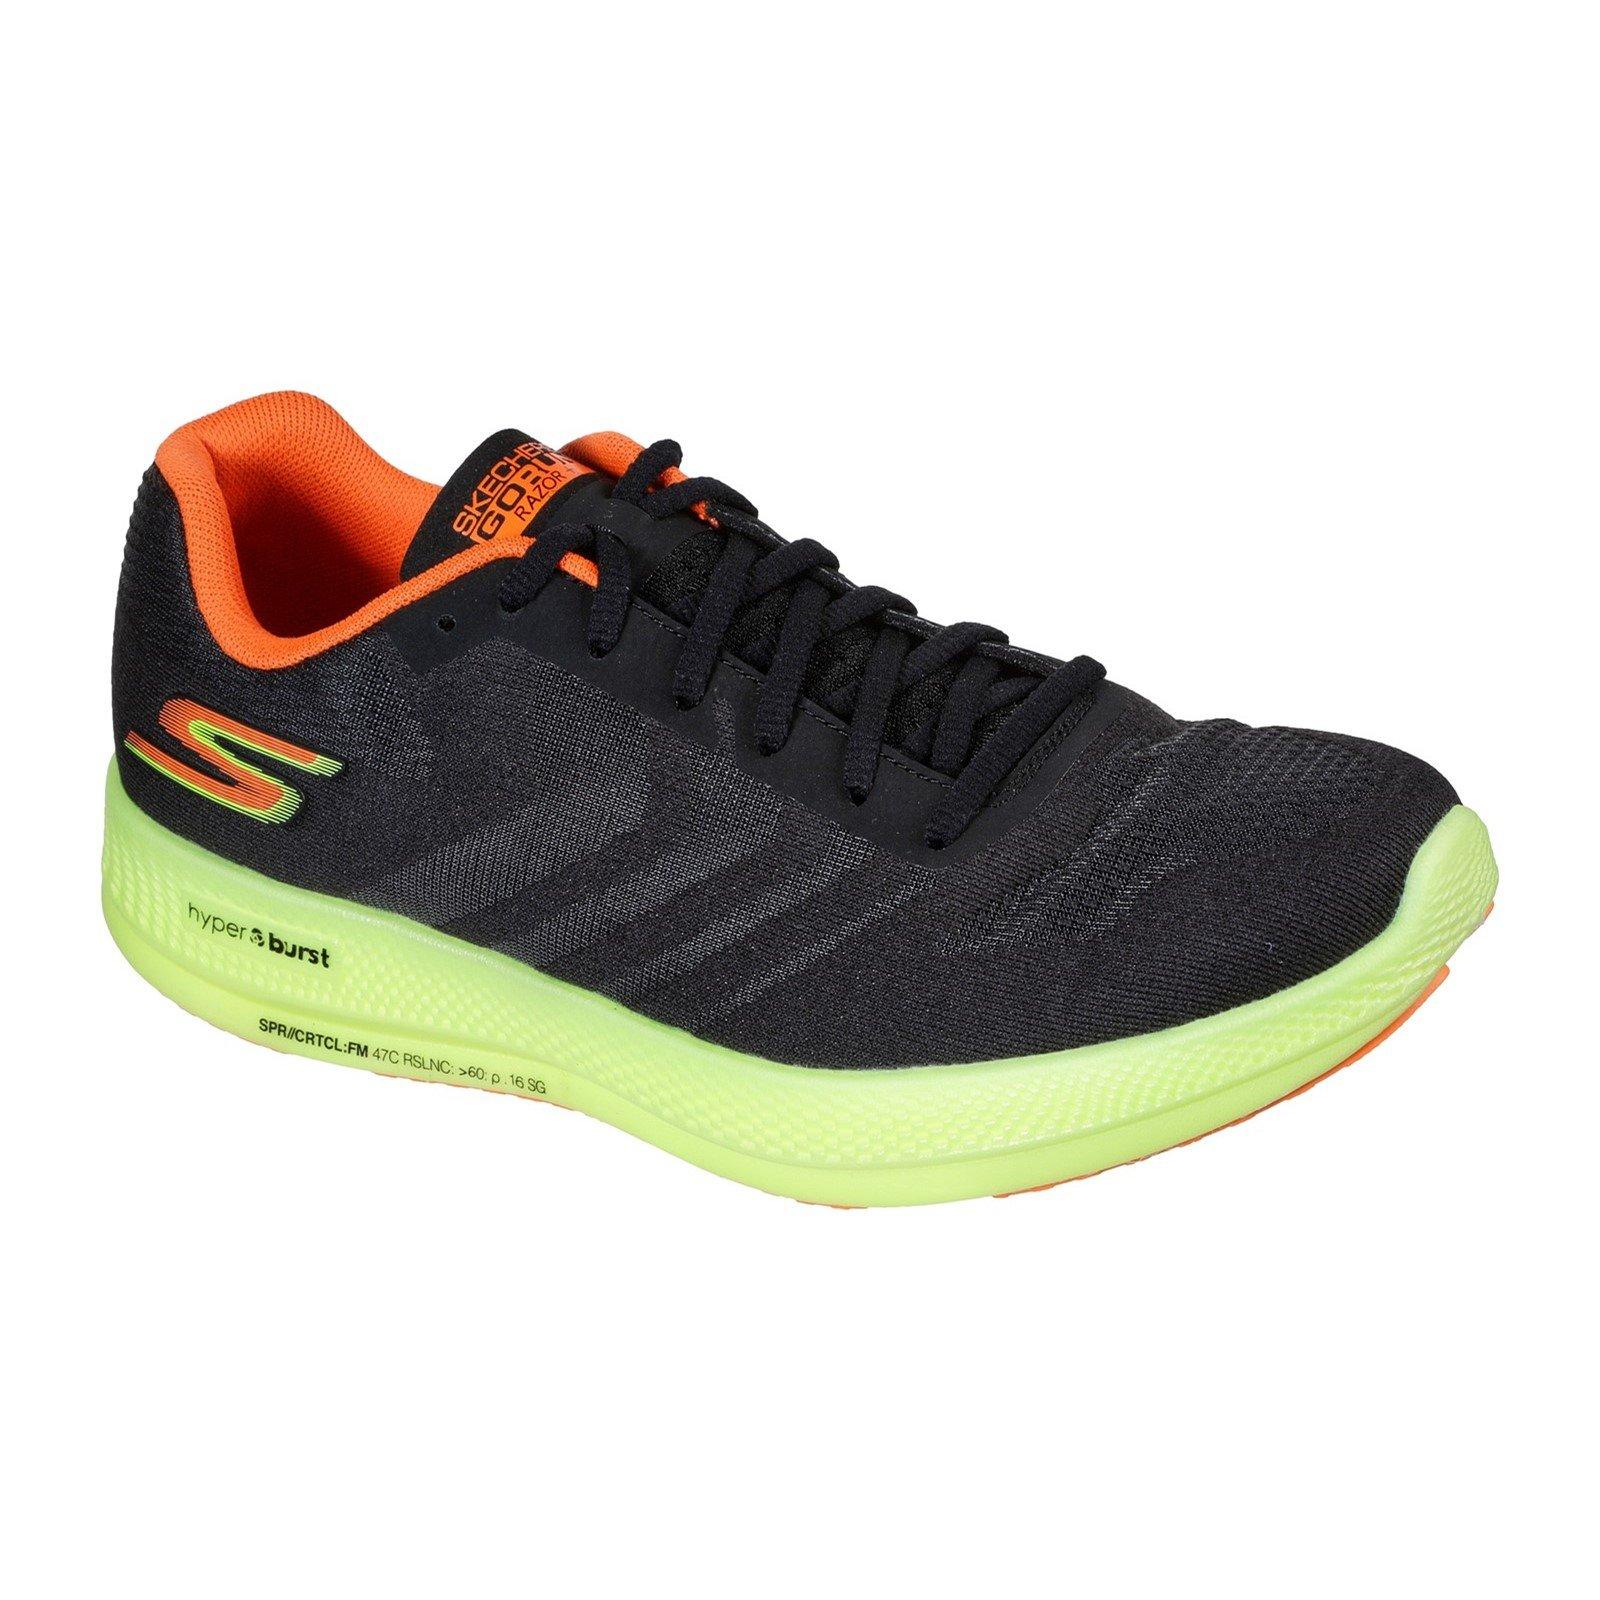 Skechers Women's Go Run Razor Trainer Various Colours 32703 - Black/Yellow/Orange 3